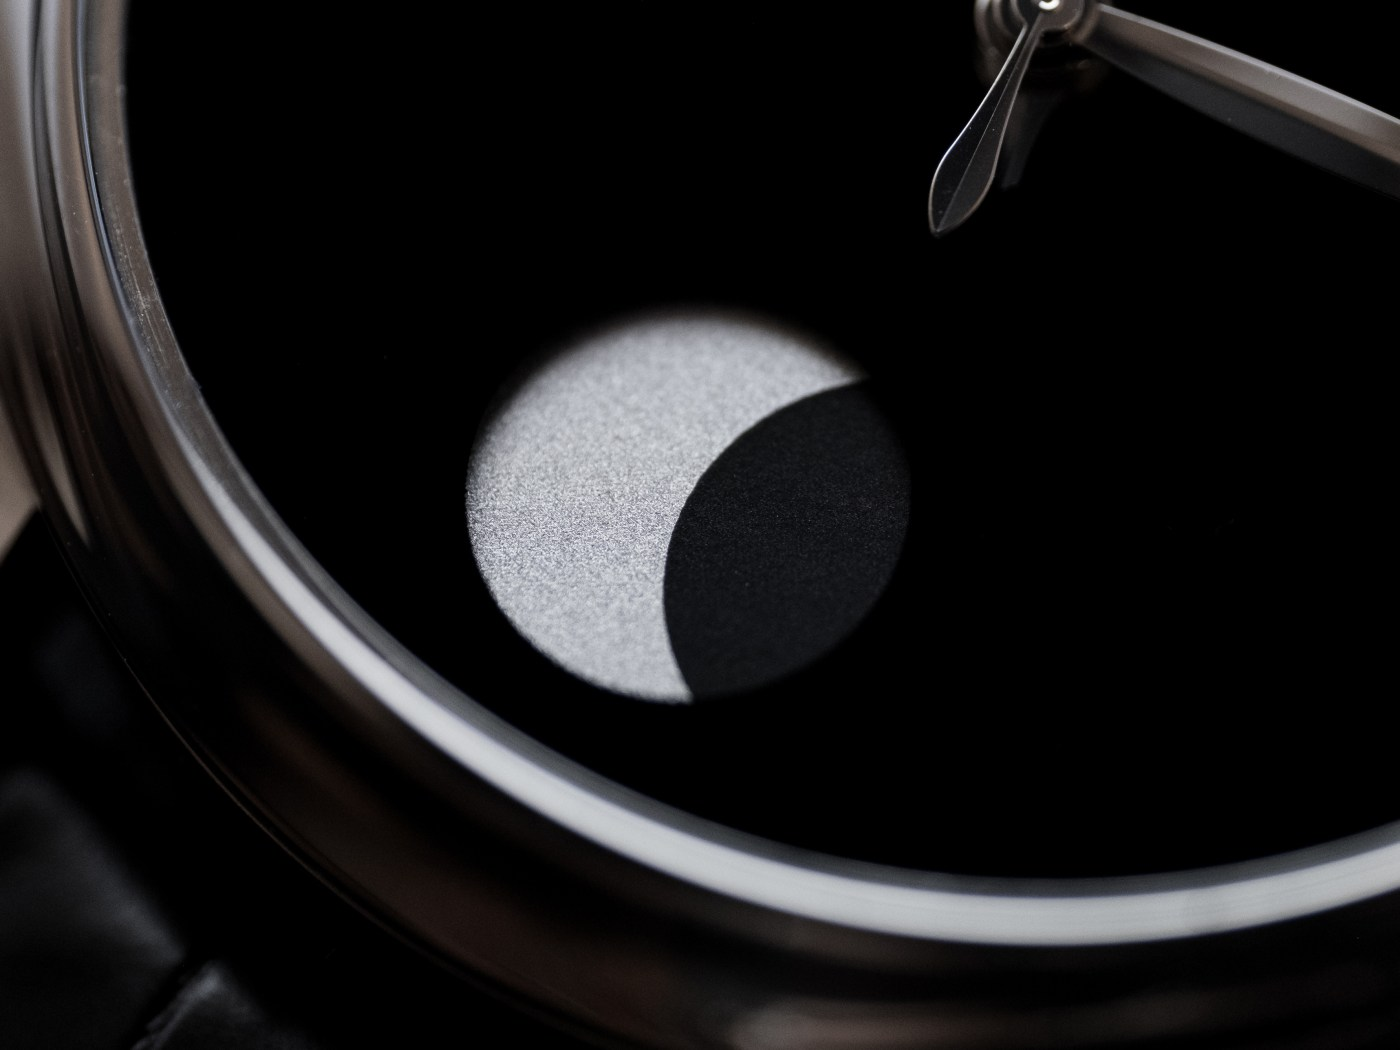 Endeavour Perpetual Moon Concept